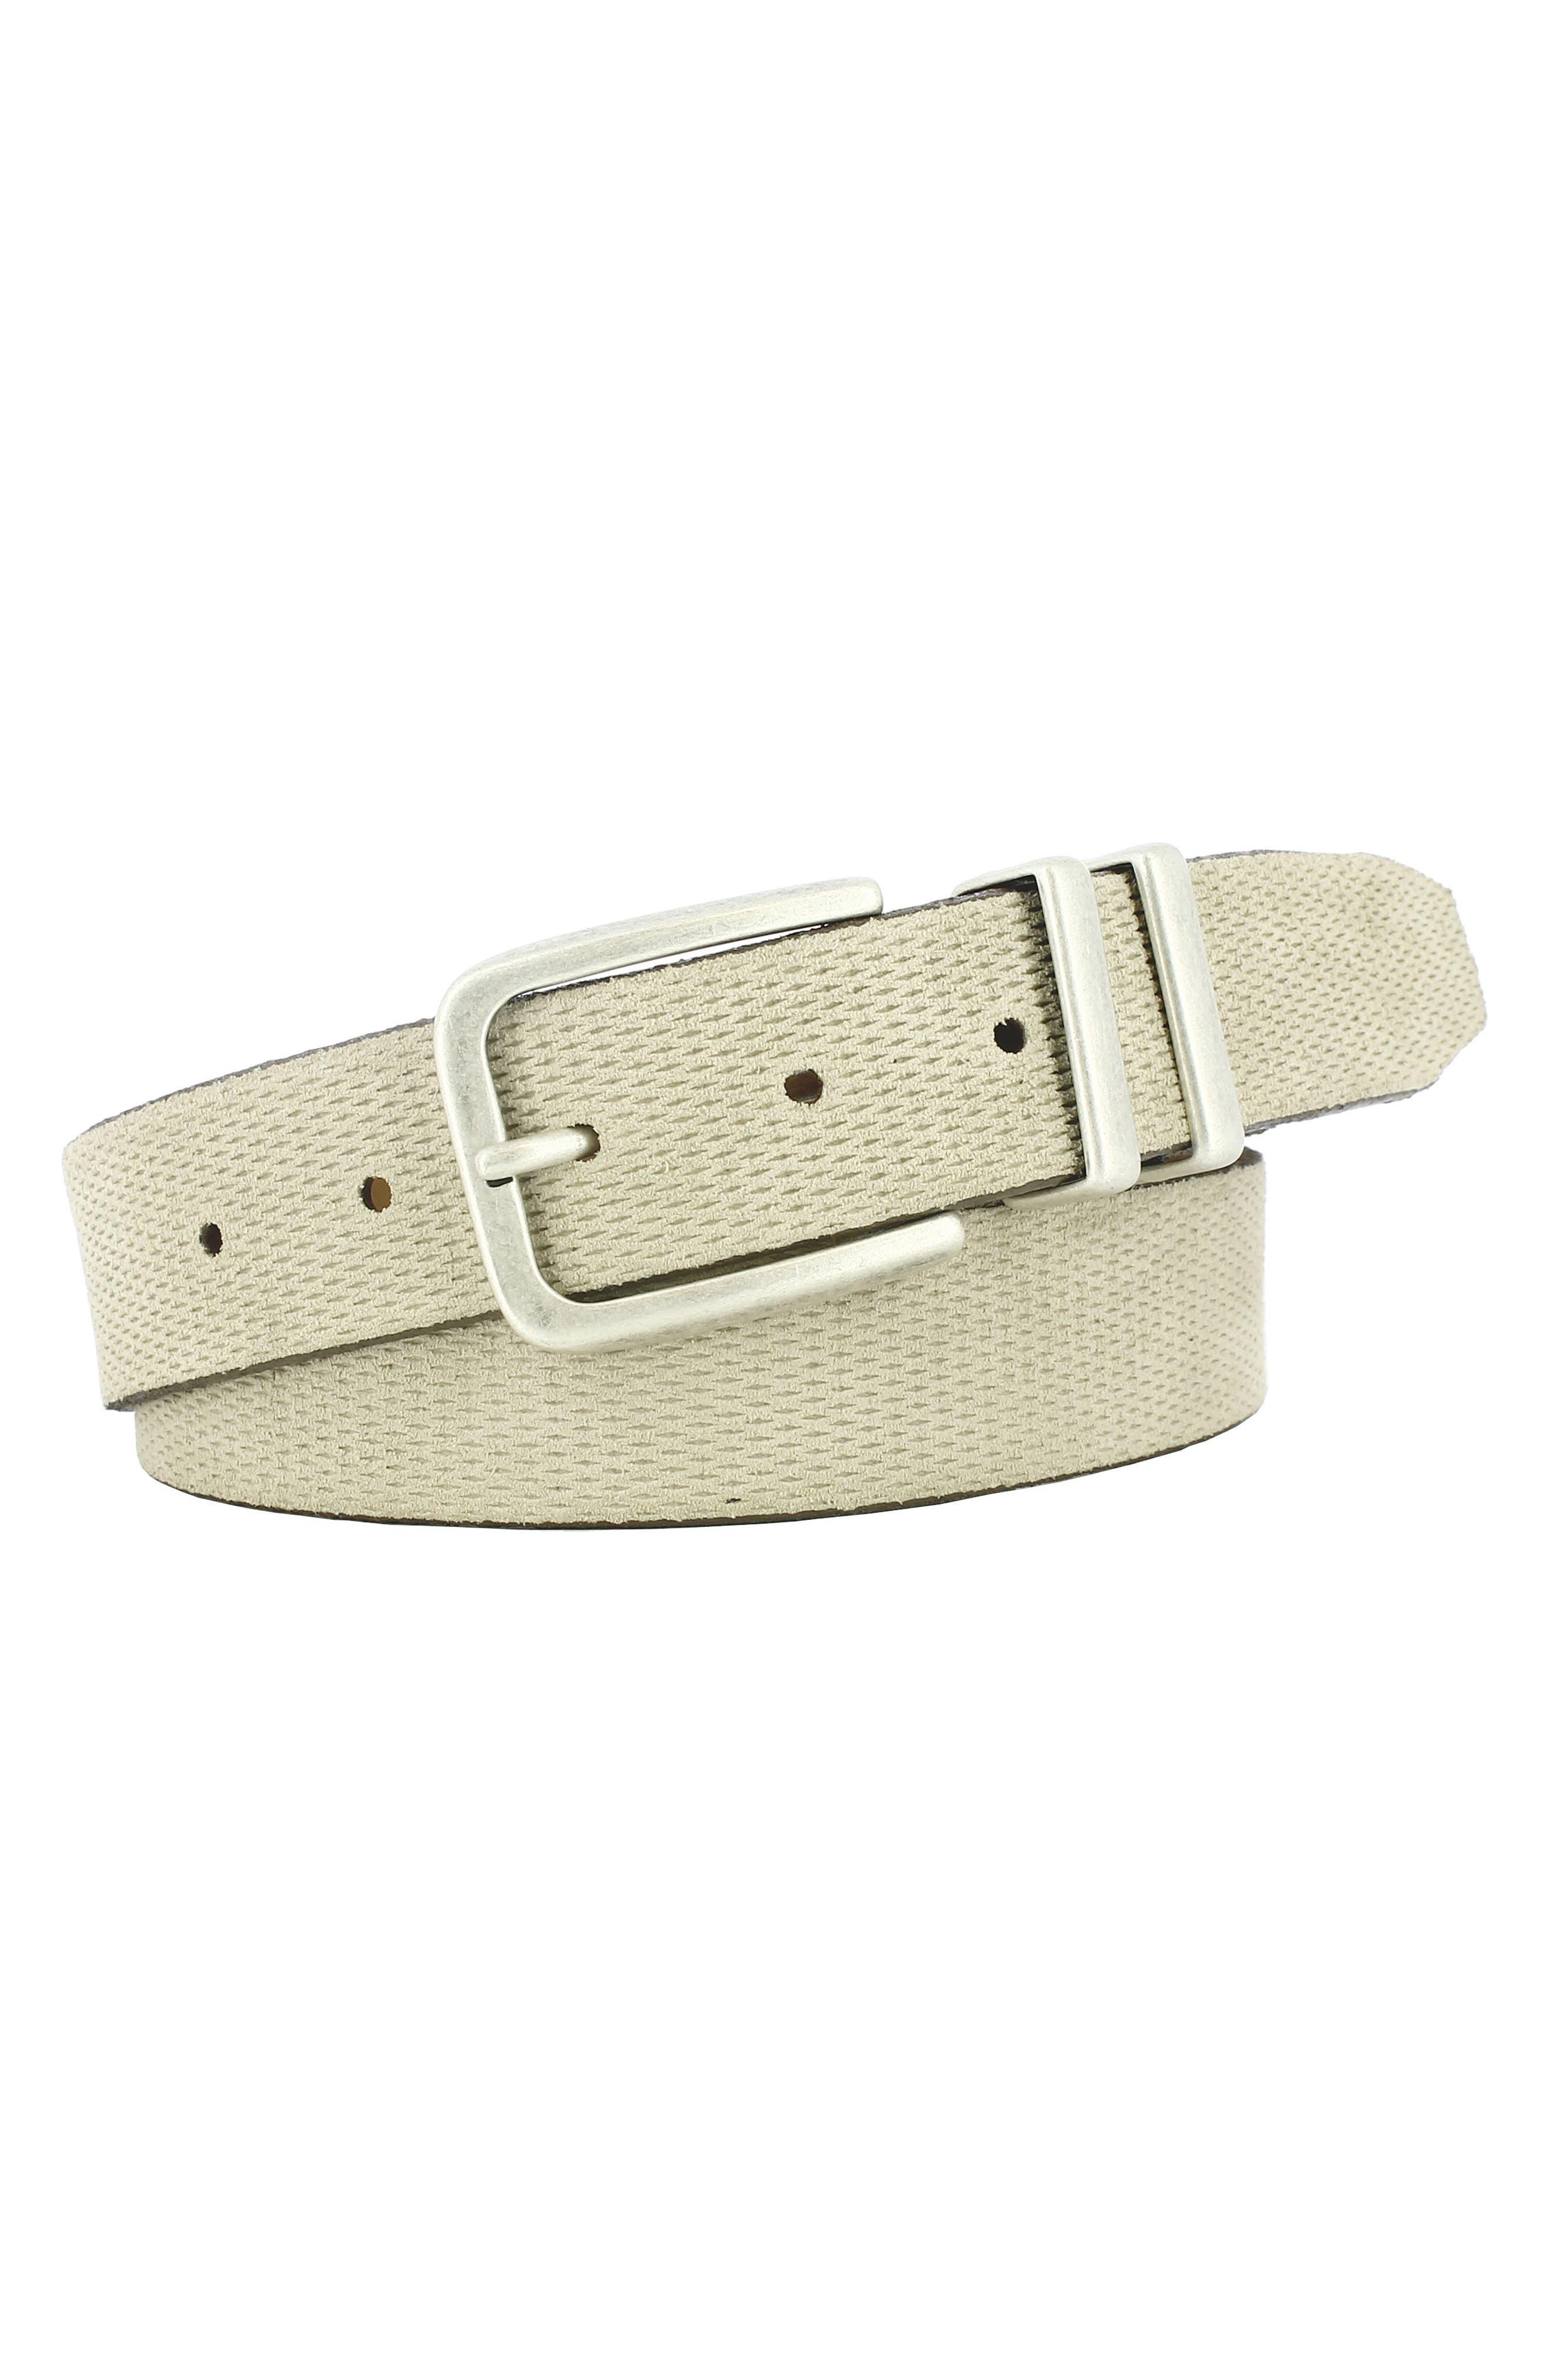 Remo Tulliani Axel Textured Leather Belt, Cream